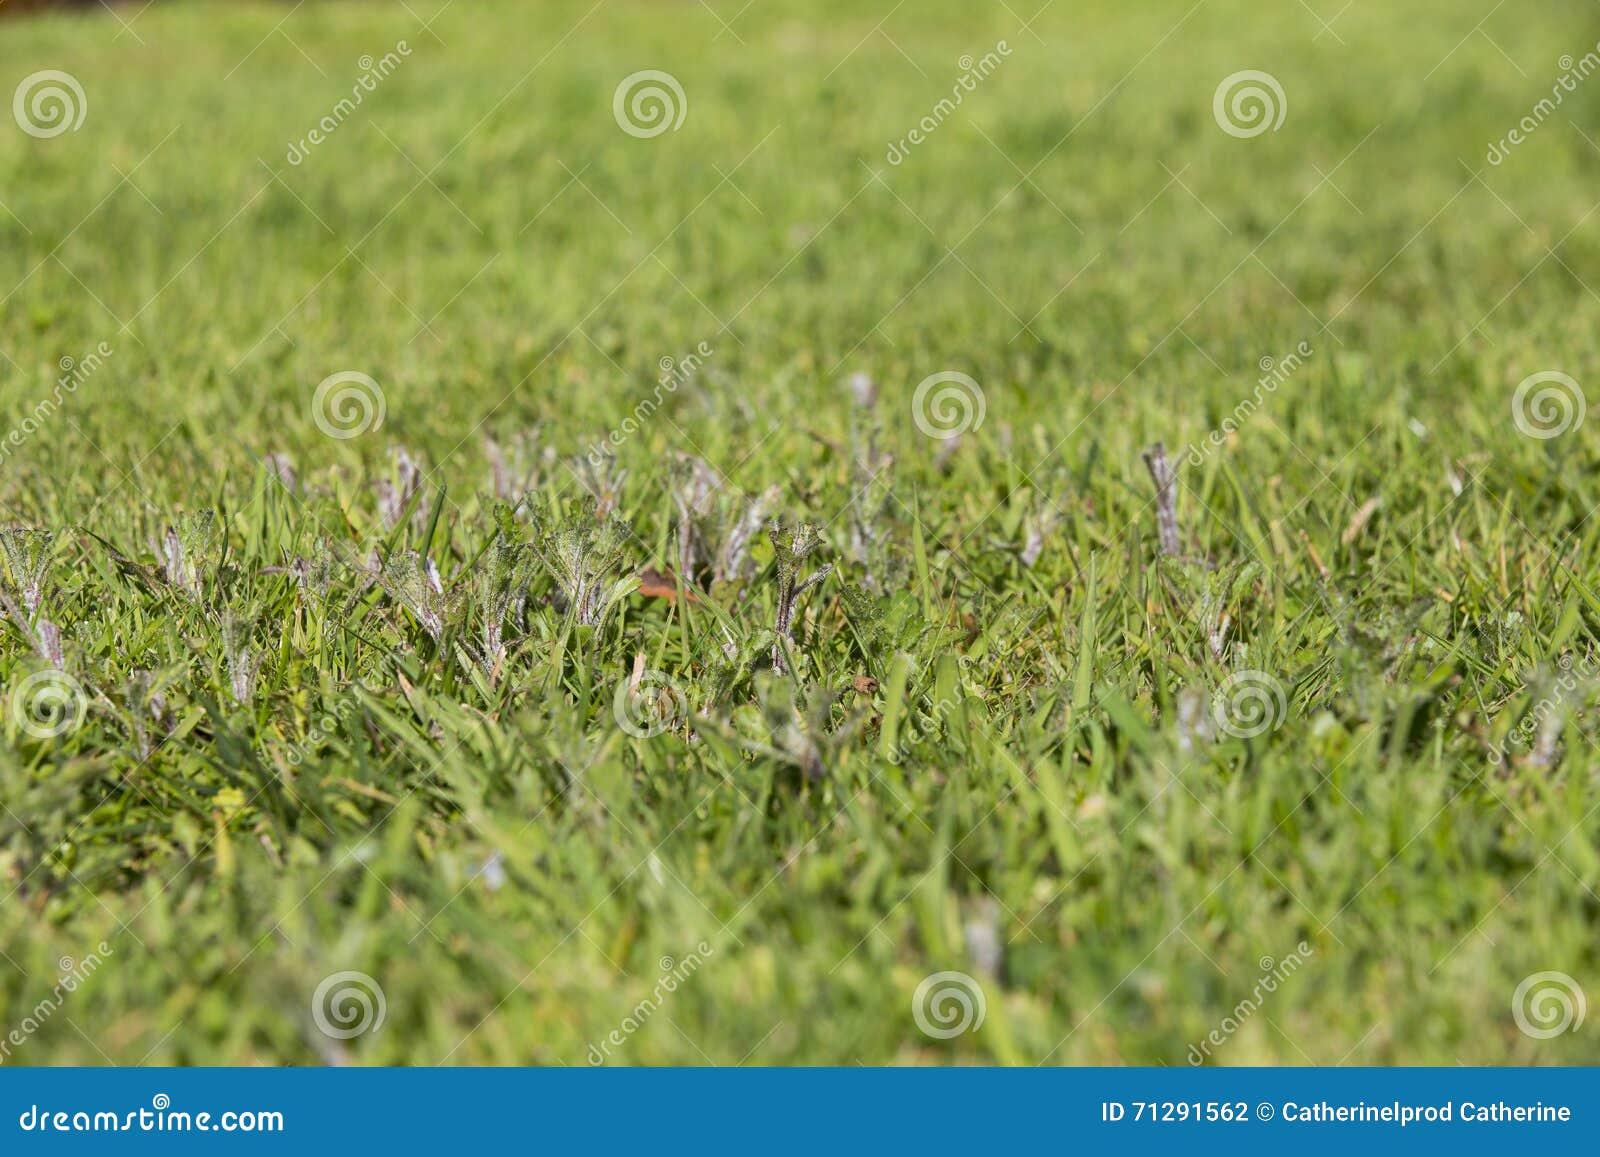 Herbe de parasites de mauvaise herbe de pelouse photo stock image 71291562 - Mauvaise herbe pelouse ...